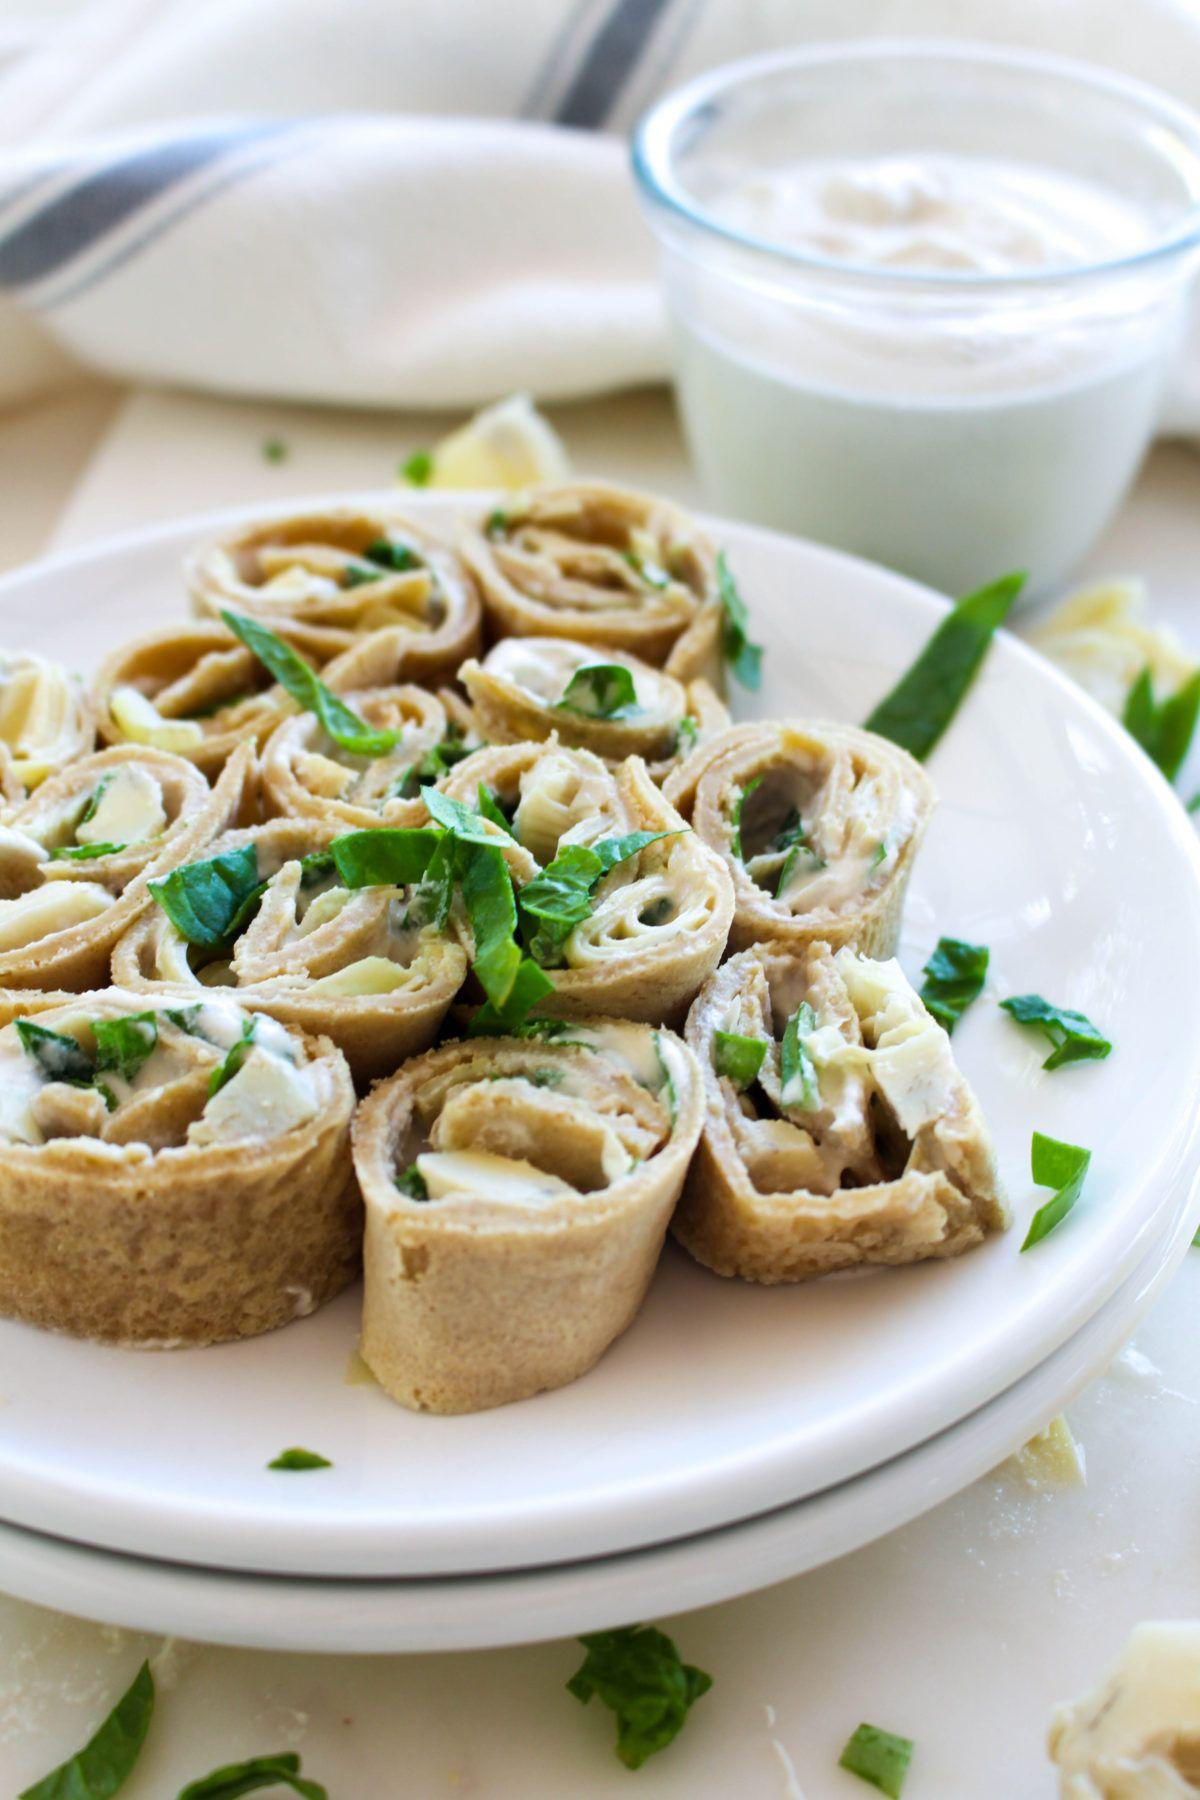 Spinach artichoke pinwheels recipe